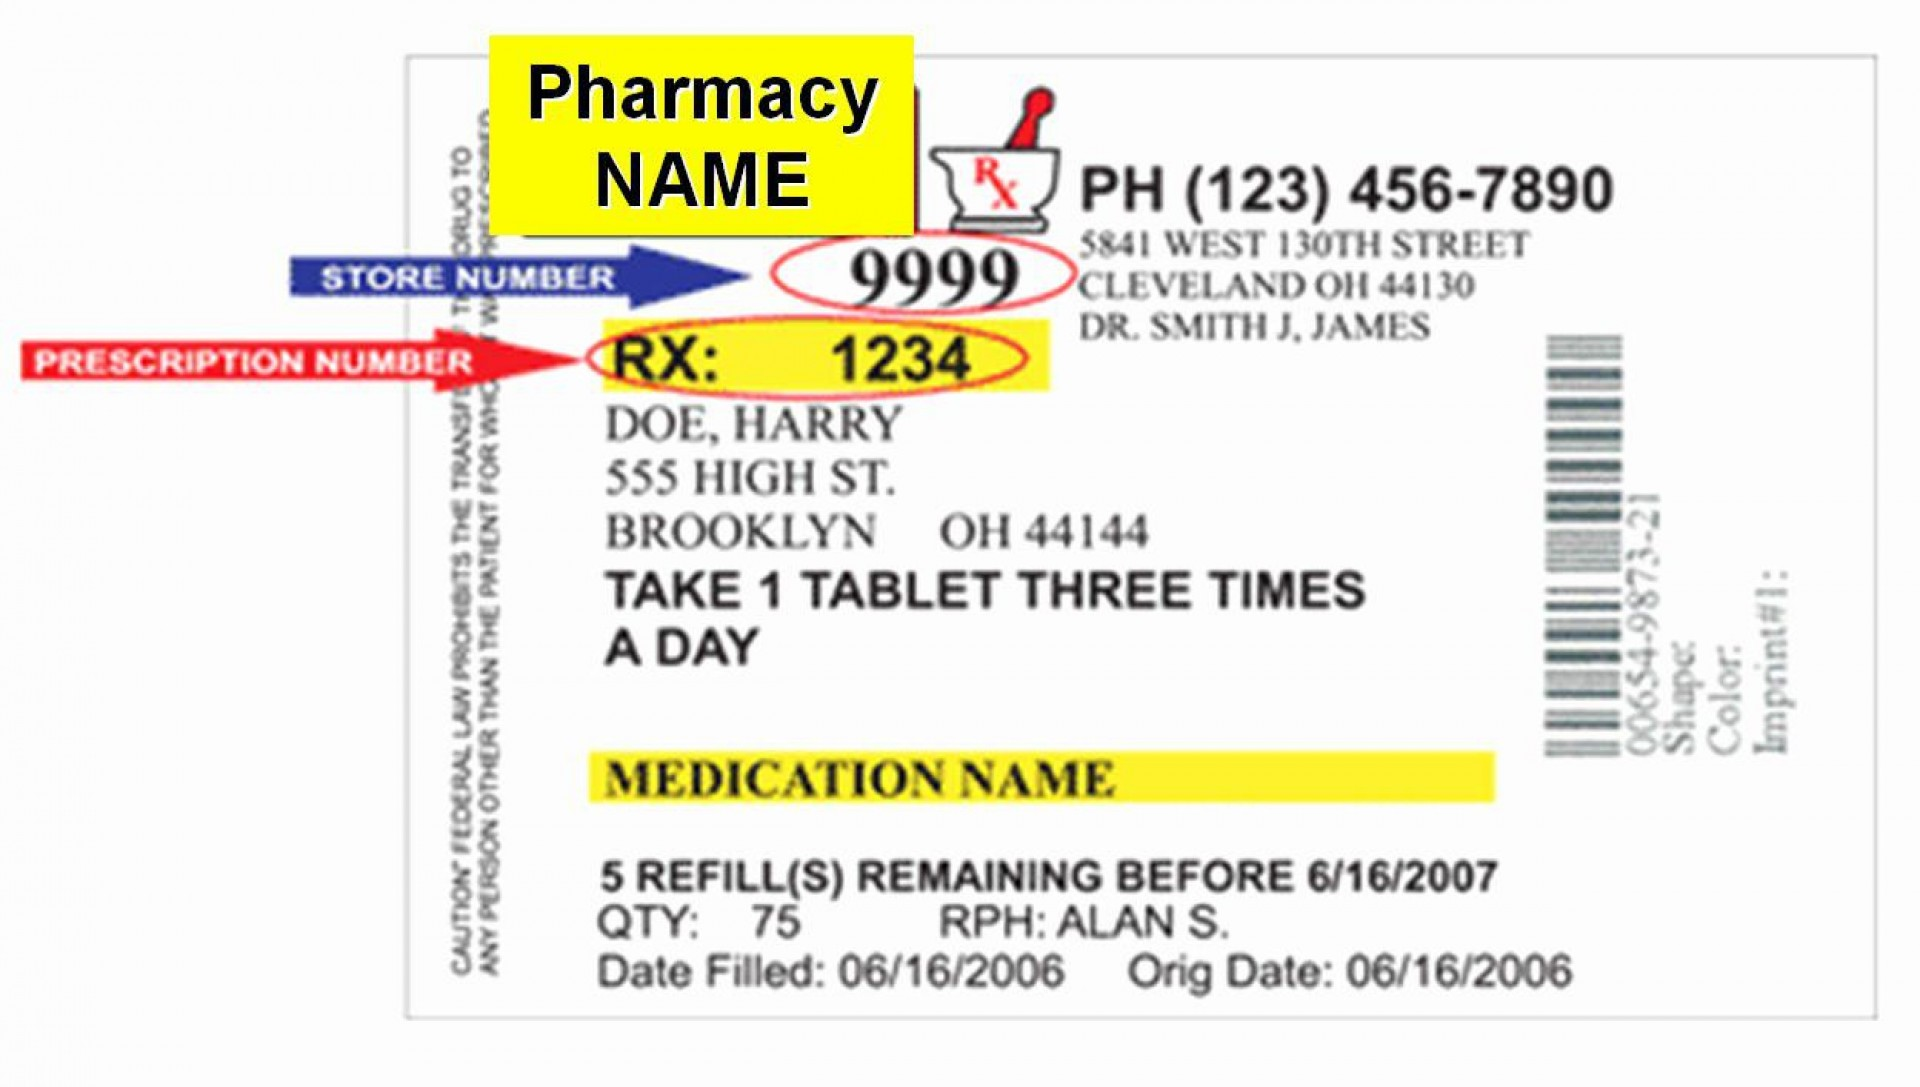 008 Shocking Fake Walgreen Prescription Label Template Photo 1920